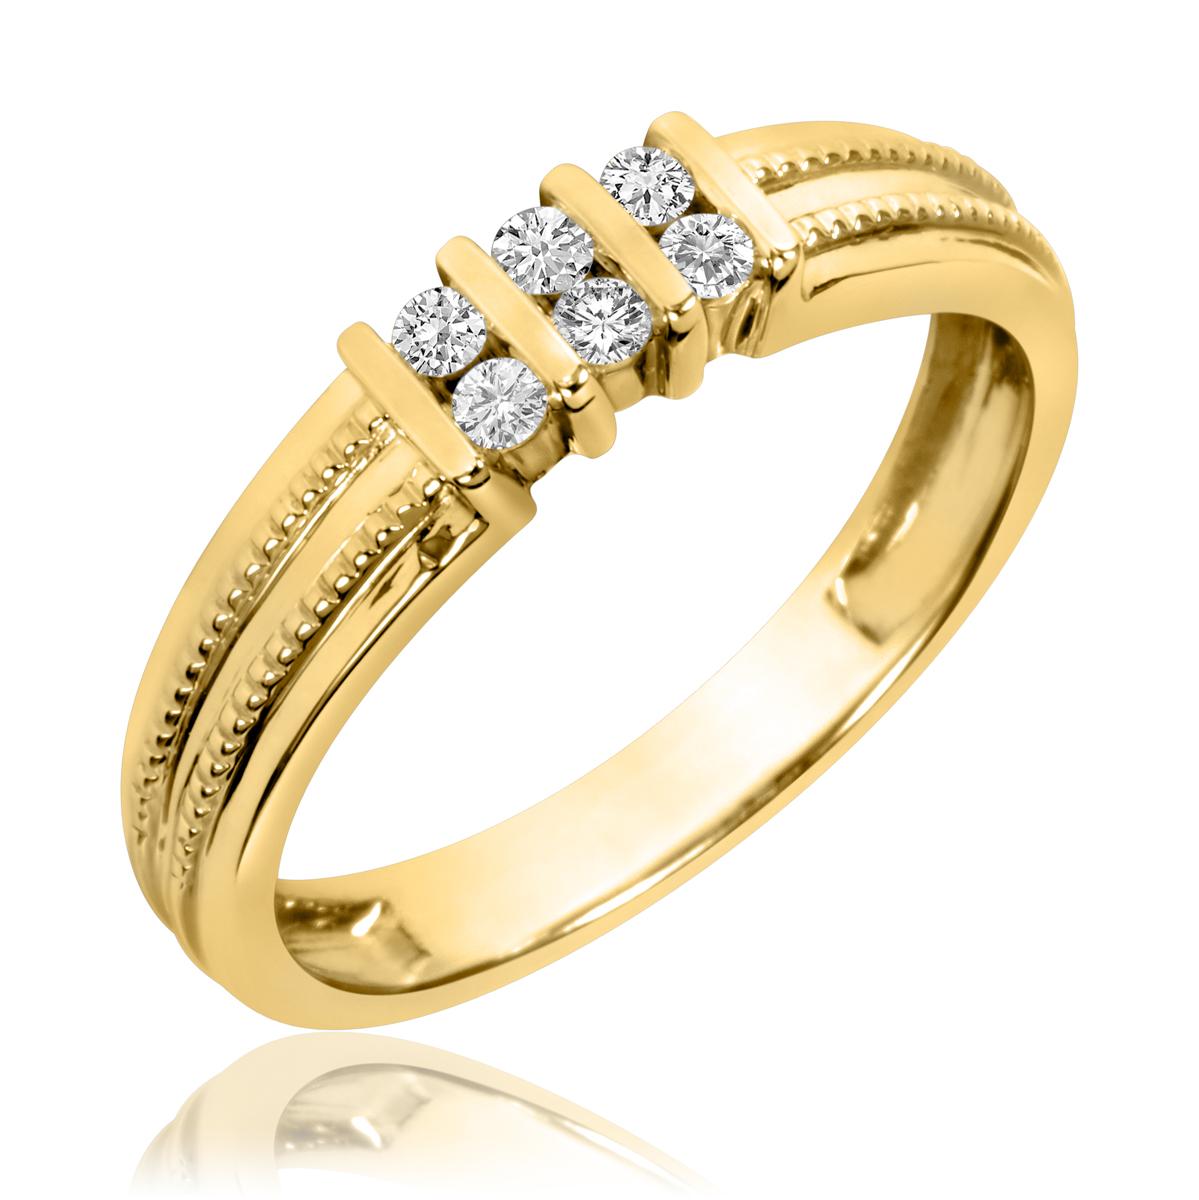 1/5 CT. T.W. Round Cut Diamond Men's Wedding Band 14K Yellow Gold- Size 8